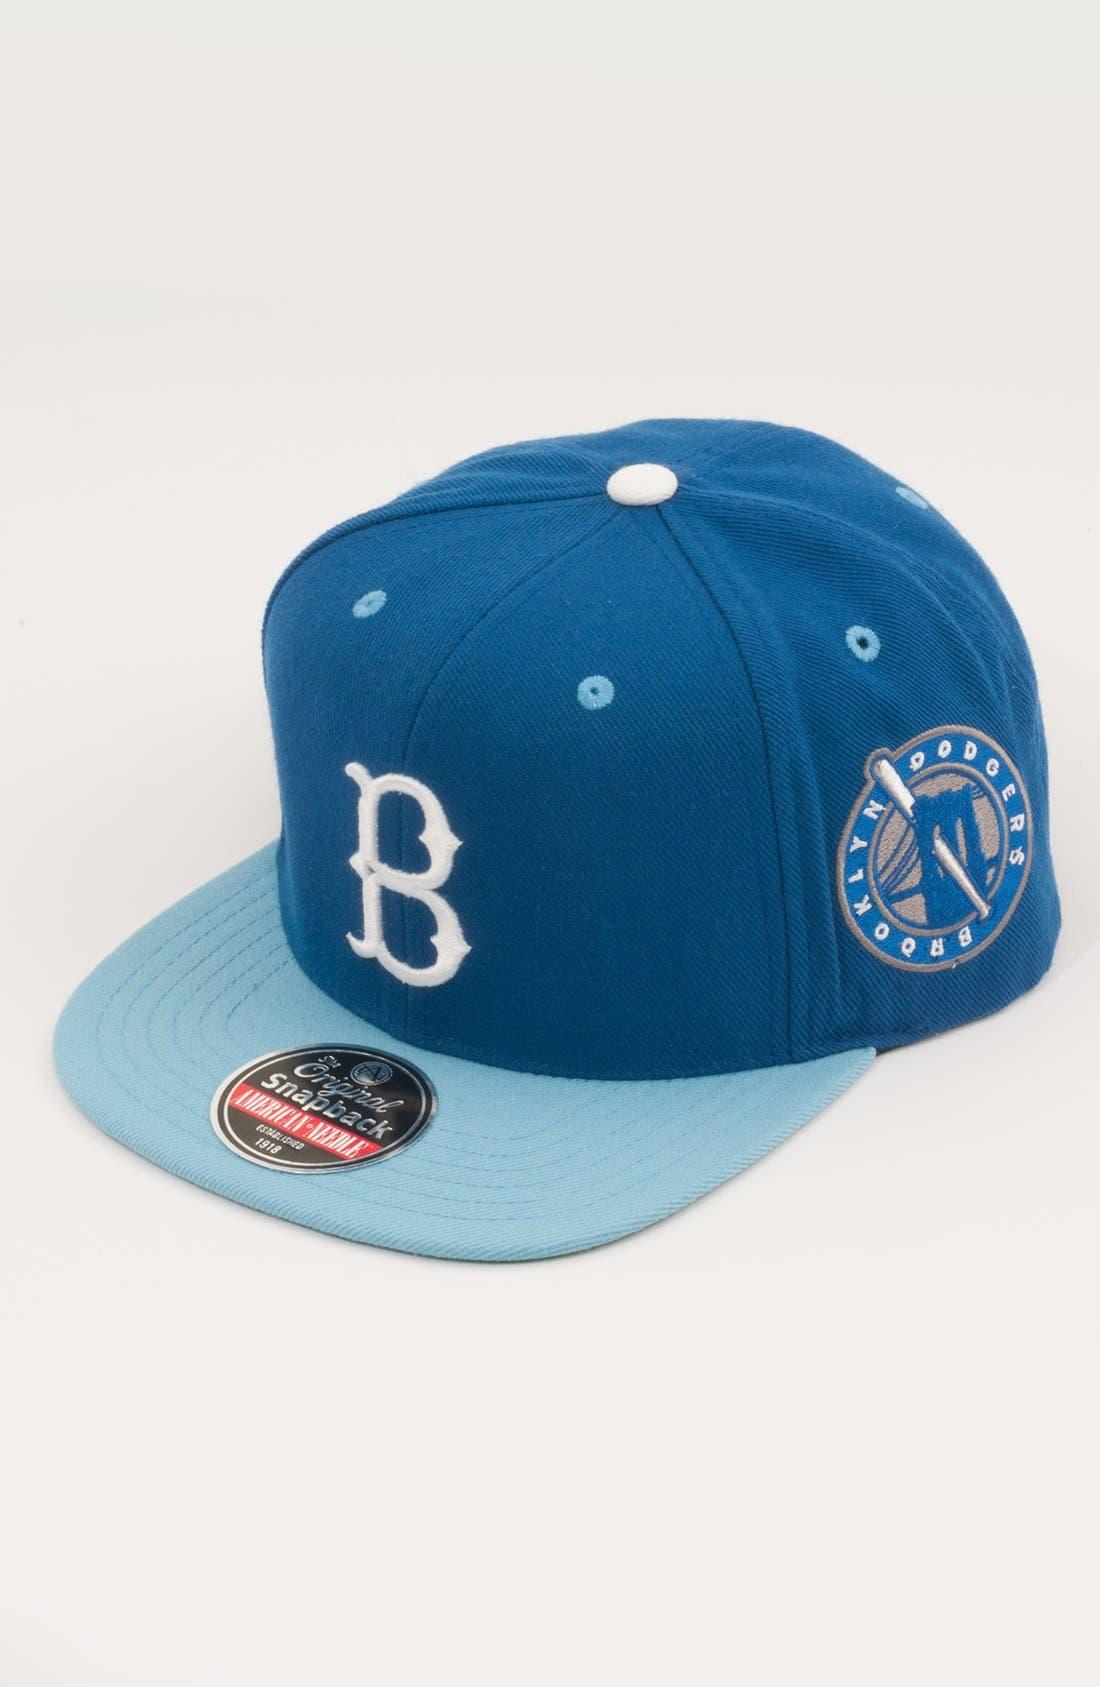 Alternate Image 1 Selected - American Needle 'Brooklyn Dodgers - Blockhead' Snapback Baseball Cap